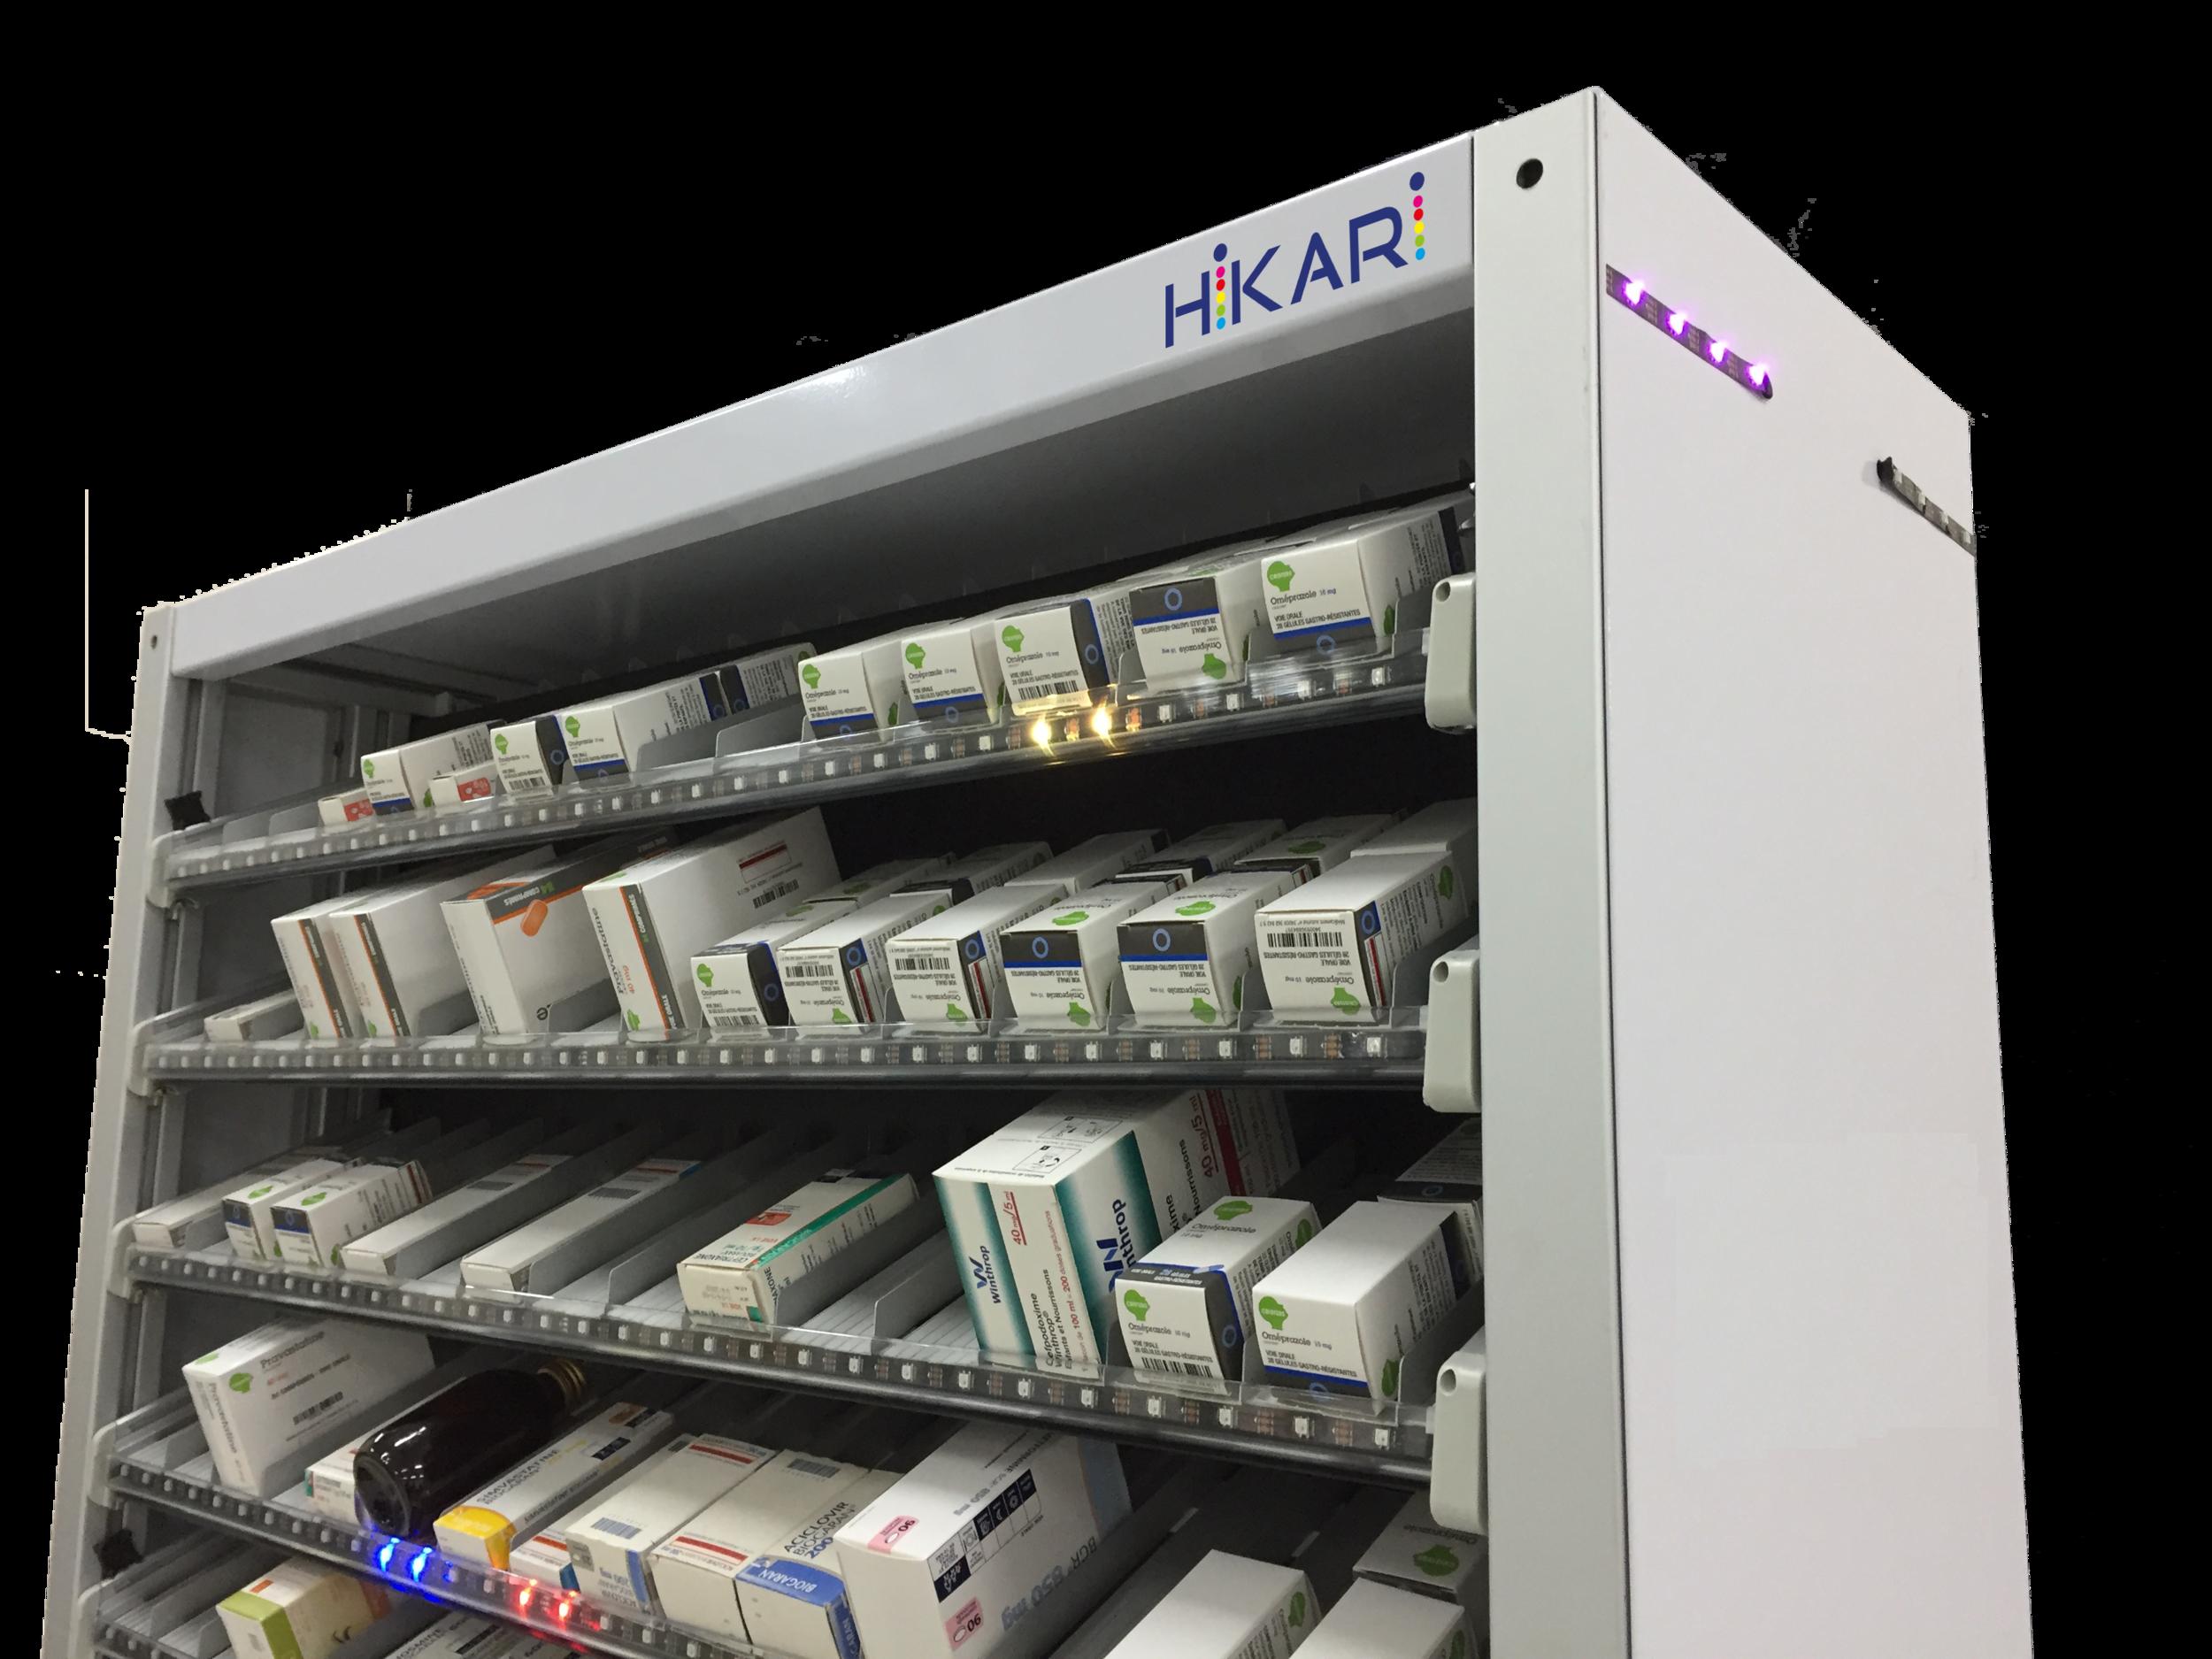 Hikari™ Inventory Storage Solution